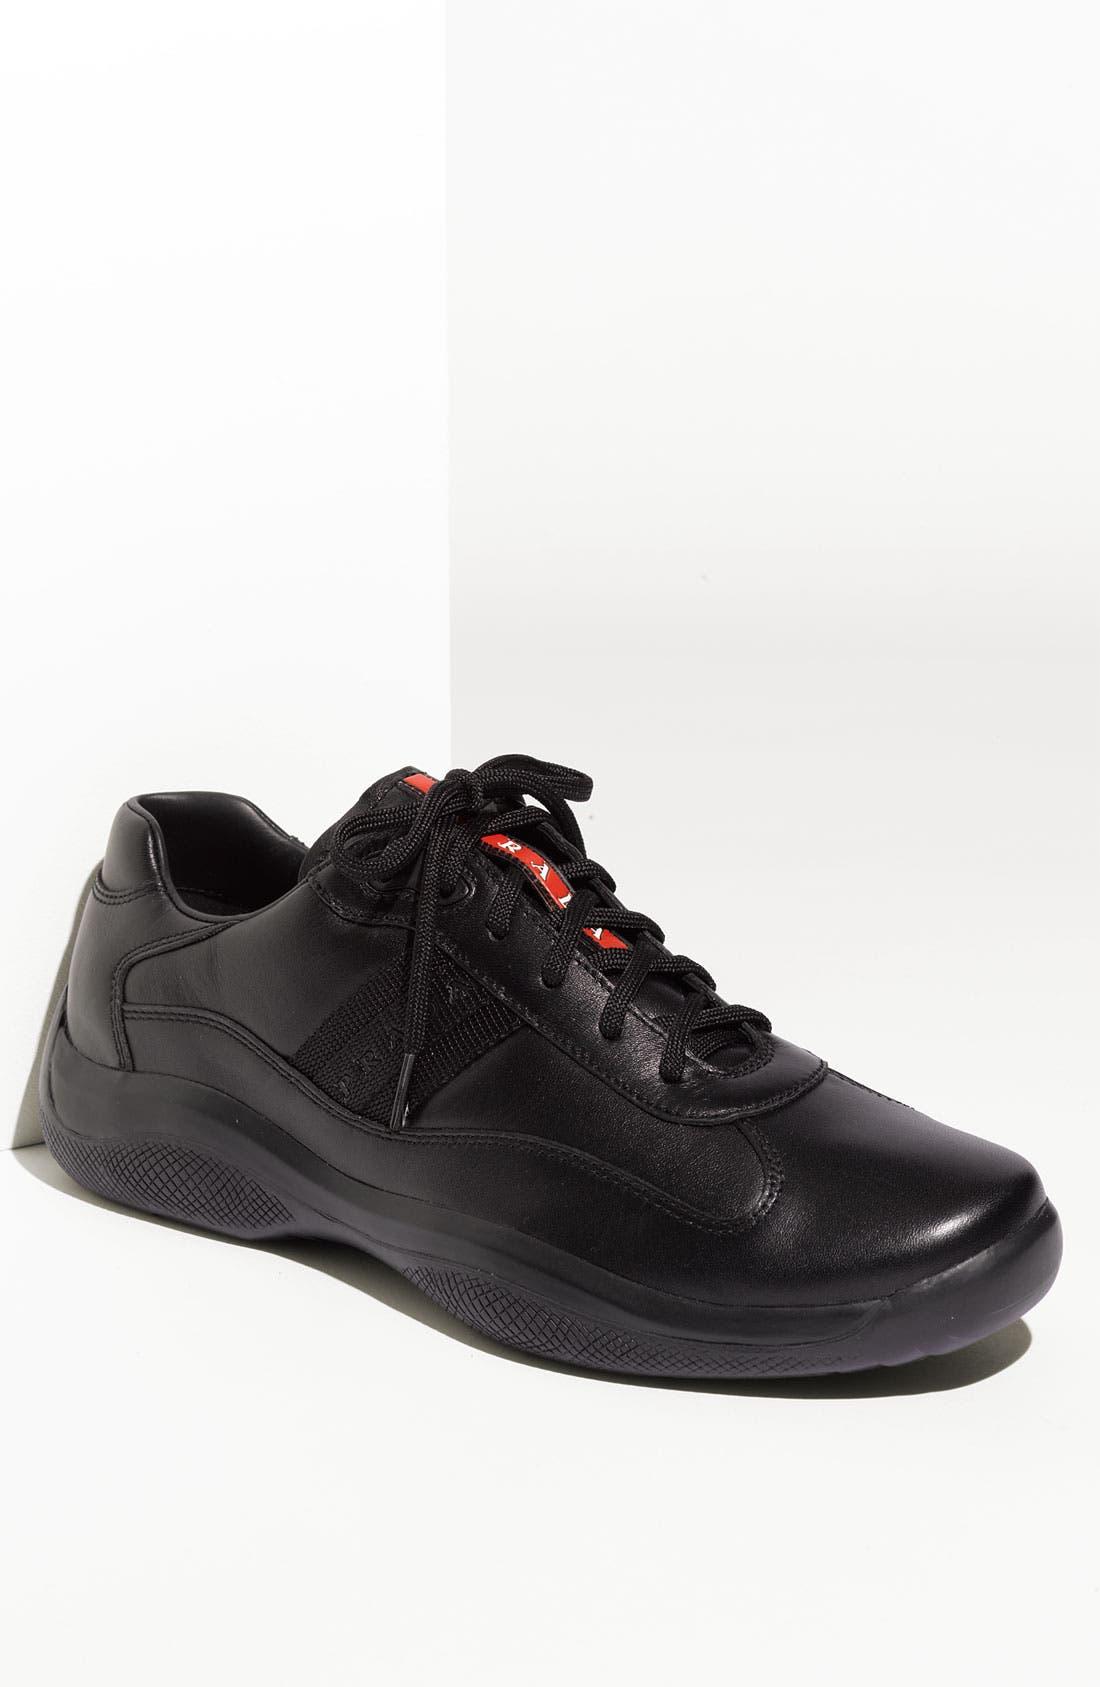 Alternate Image 1 Selected - Prada 'Eagle' Lace-Up Sneaker (Men)